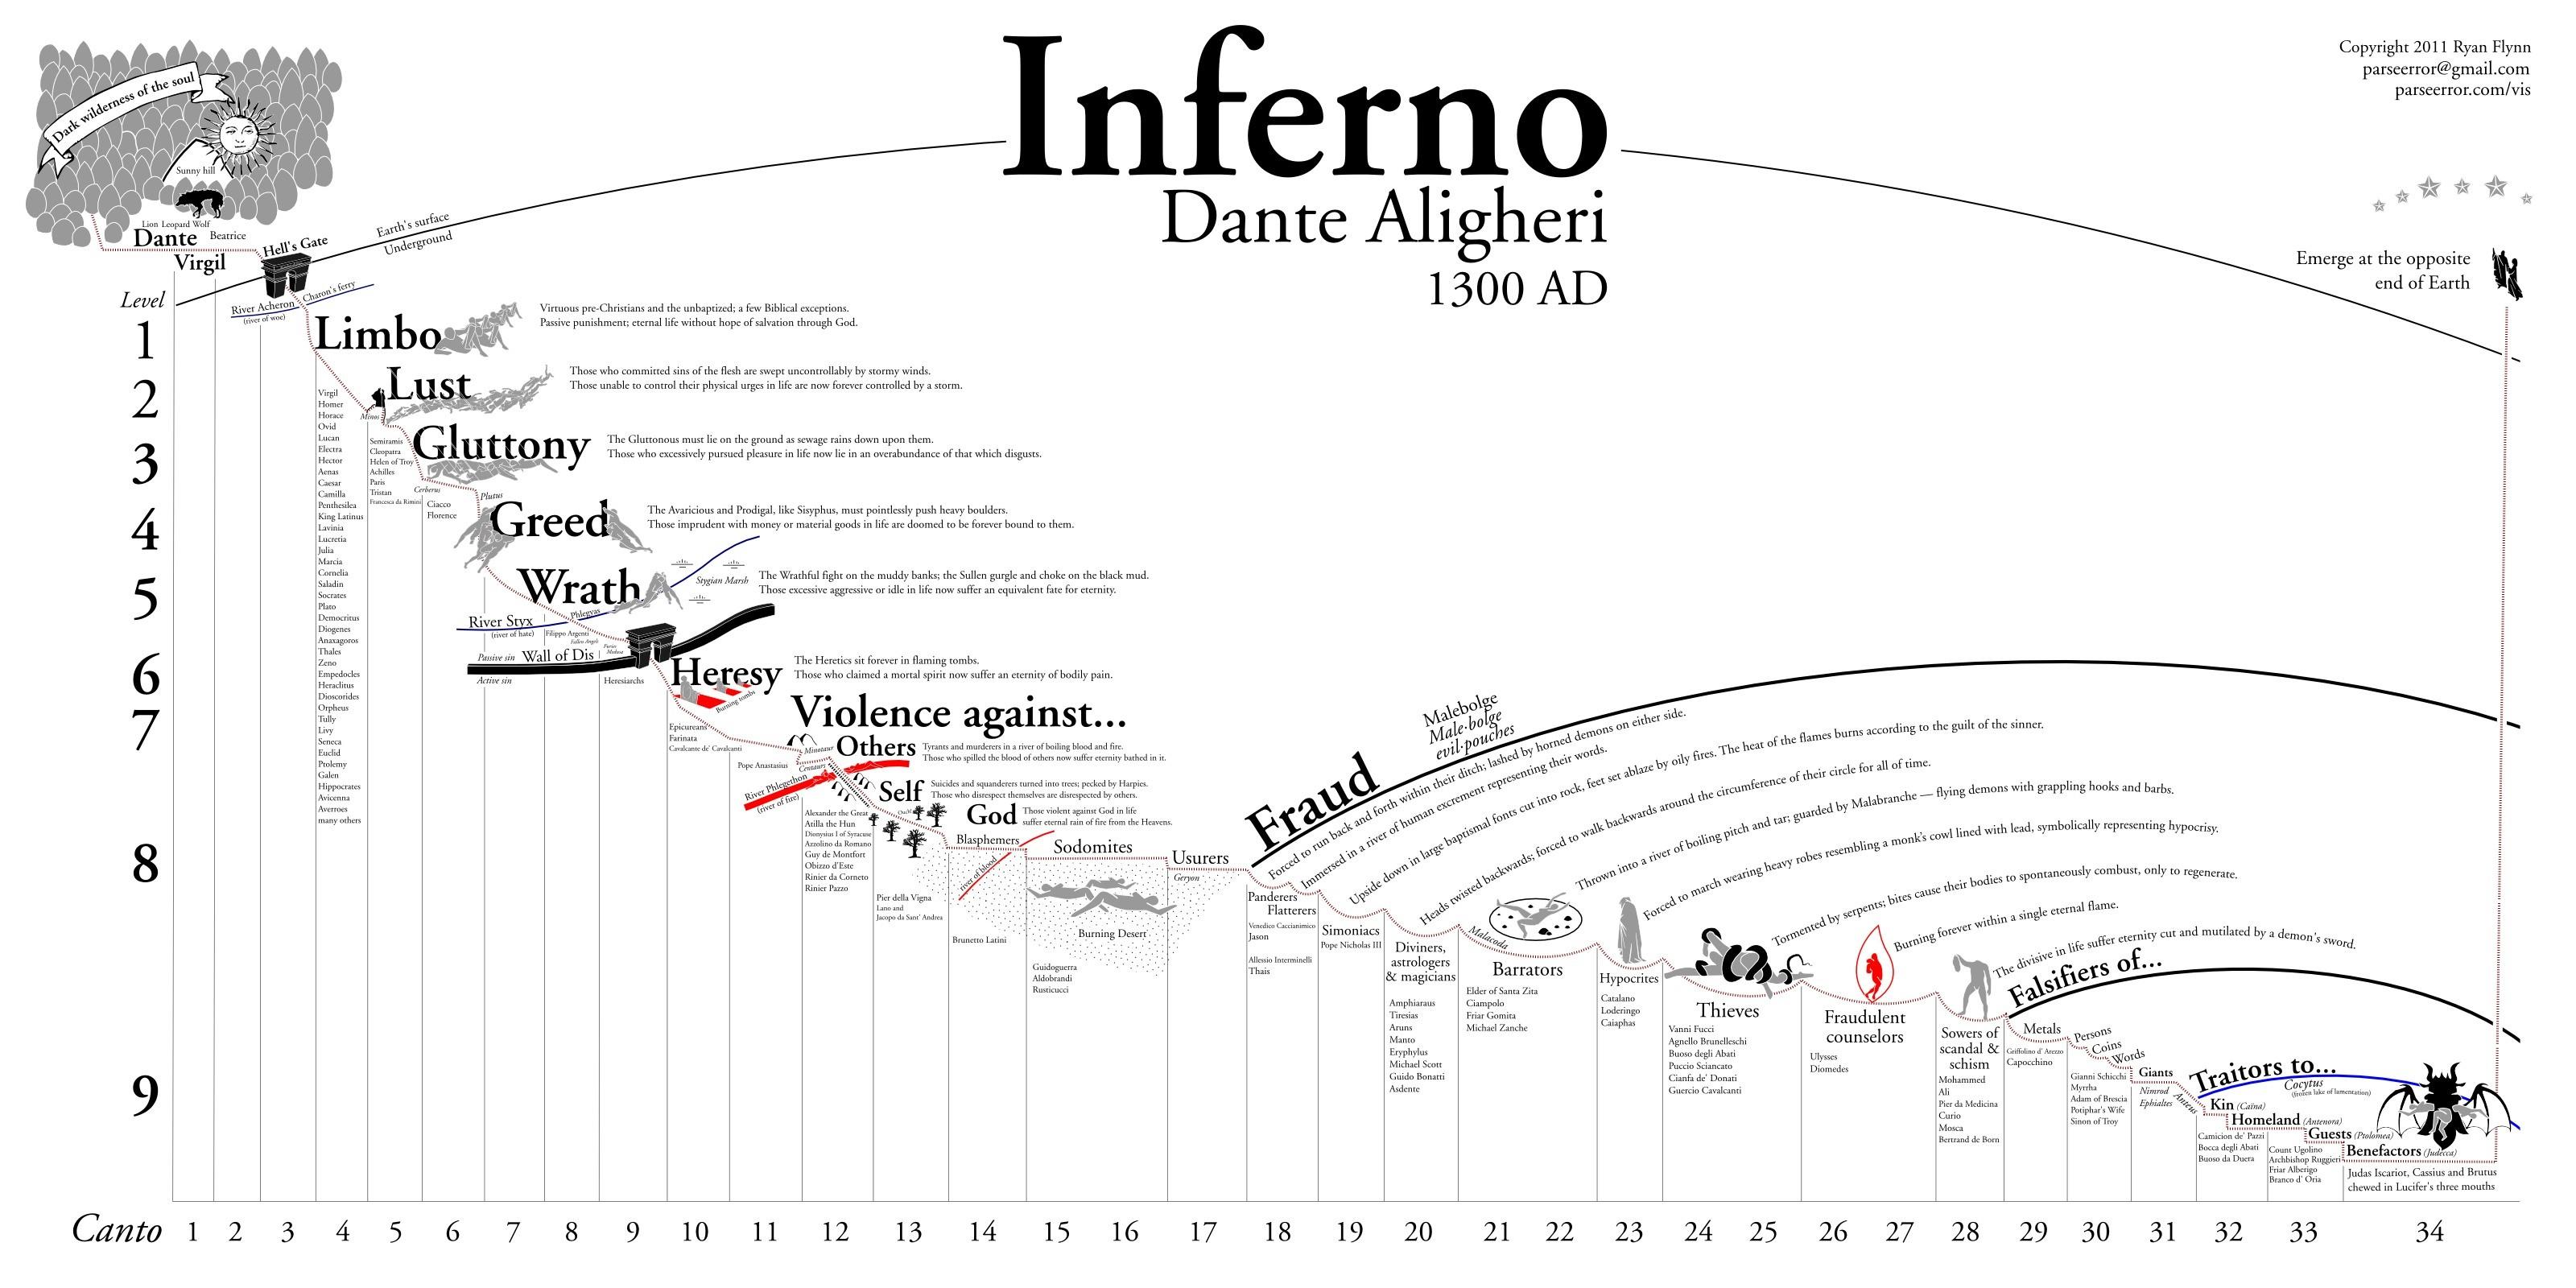 Map Of Hell According To Dante Alighieri